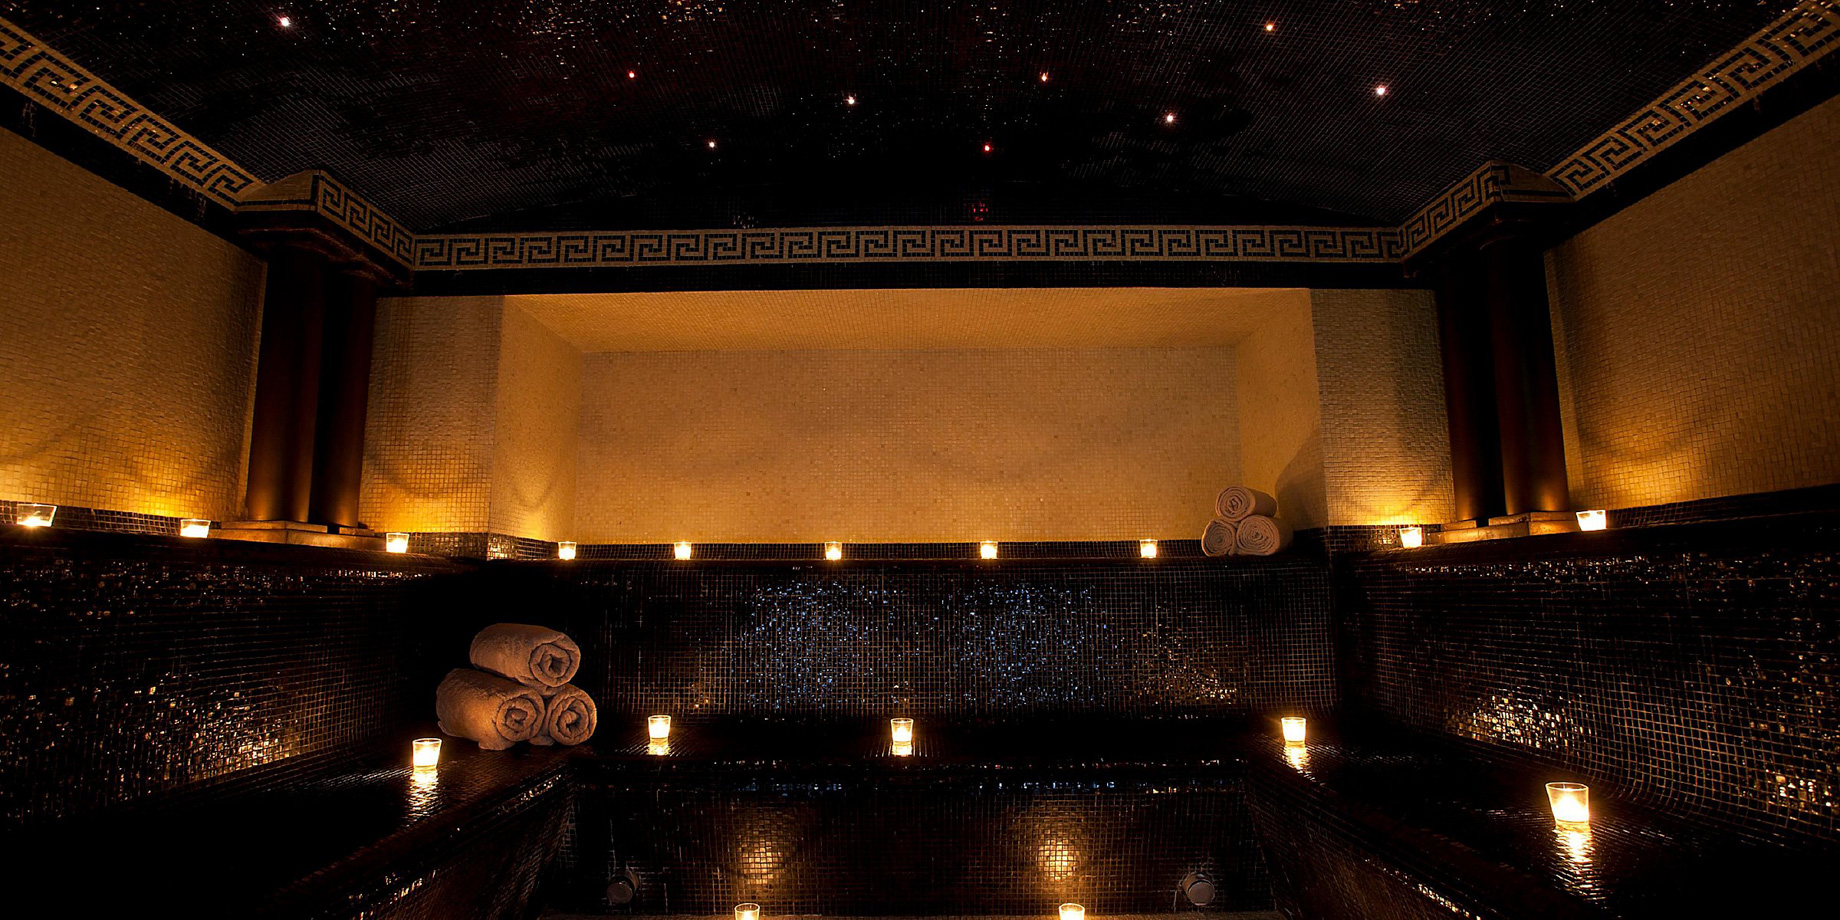 InterContinental Bordeaux Le Grand Hotel – Bordeaux, France – Spa Guerlain Relaxation